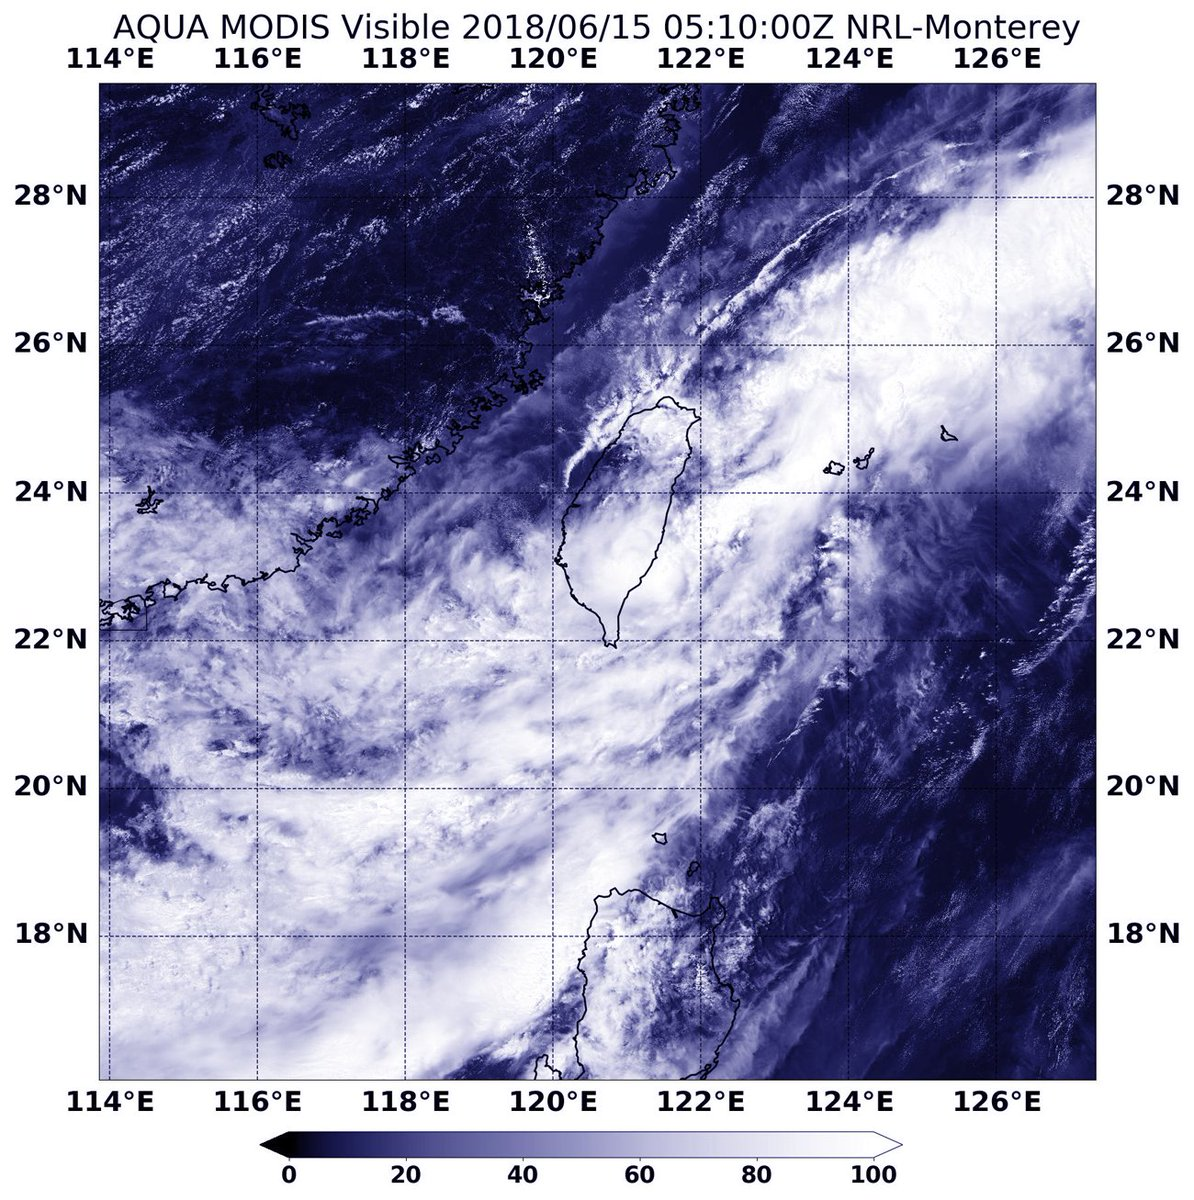 Aqua Satellite Sees Tropical Depression Gaemi Exit Taiwan: Latest